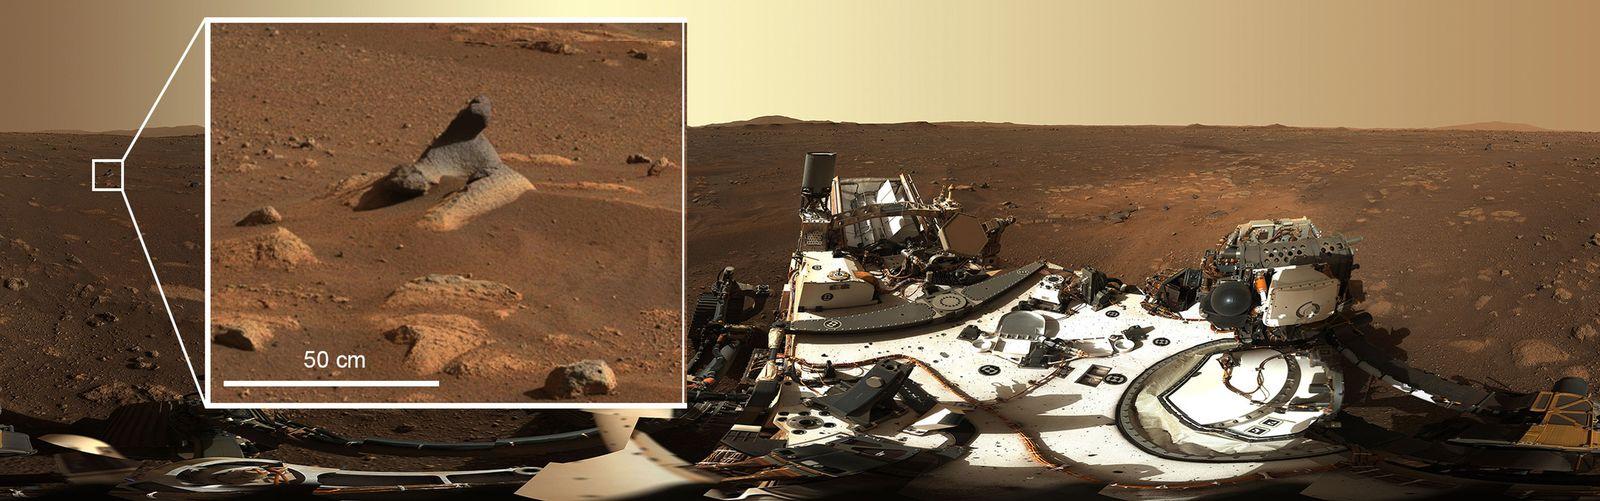 Nasa-Rover «Perseverance» auf dem Mars